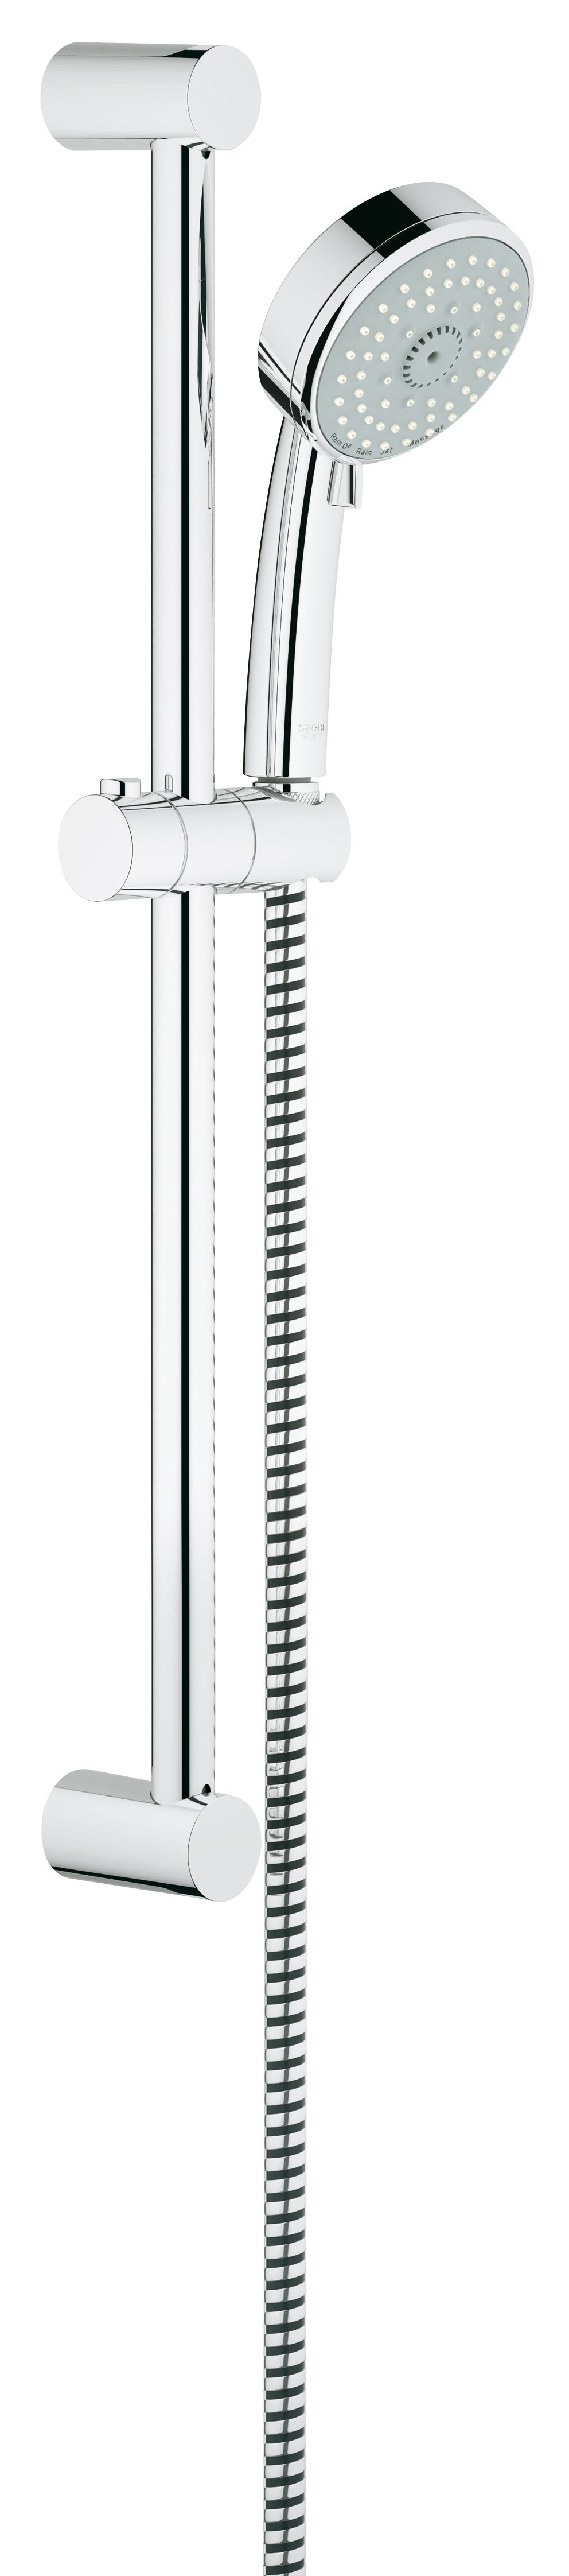 Grohe 27580001 Tempesta Cosmopolitan (ручной душ, штанга 600 мм, шланг 1750 мм), хром